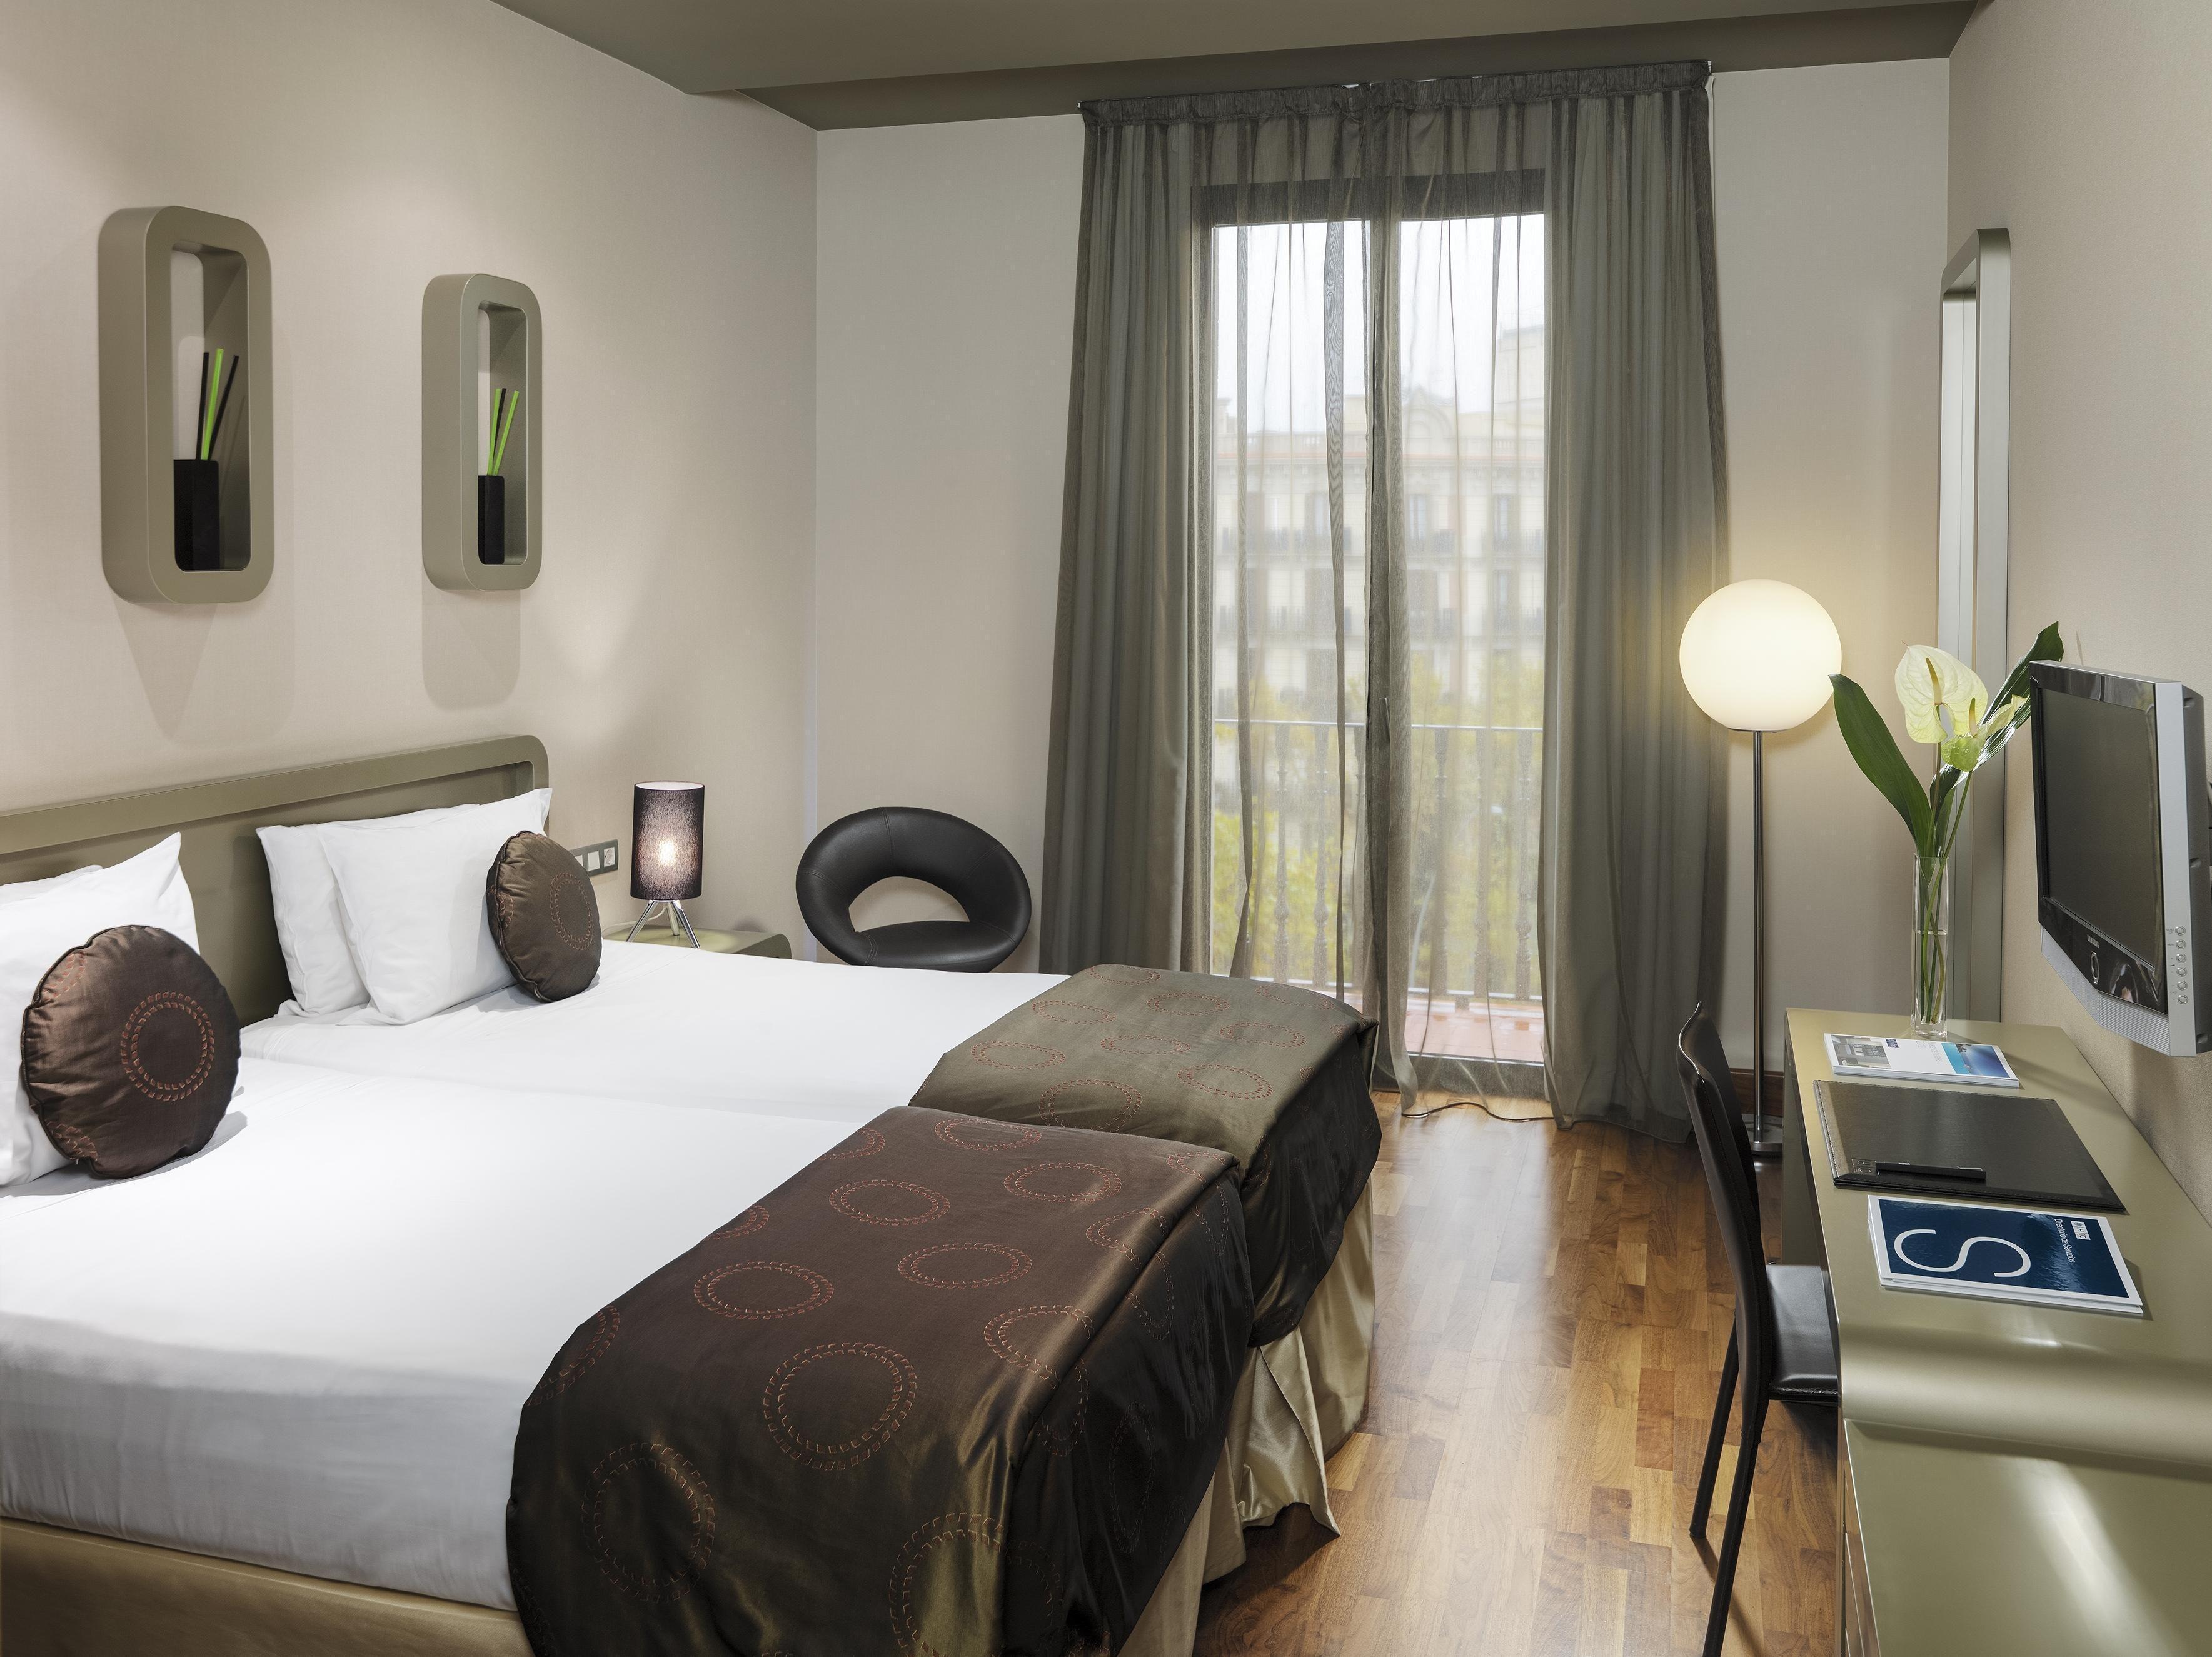 H10 Casanova Hotel Barcelona Spain Barcelona Hotels Bedroom Design